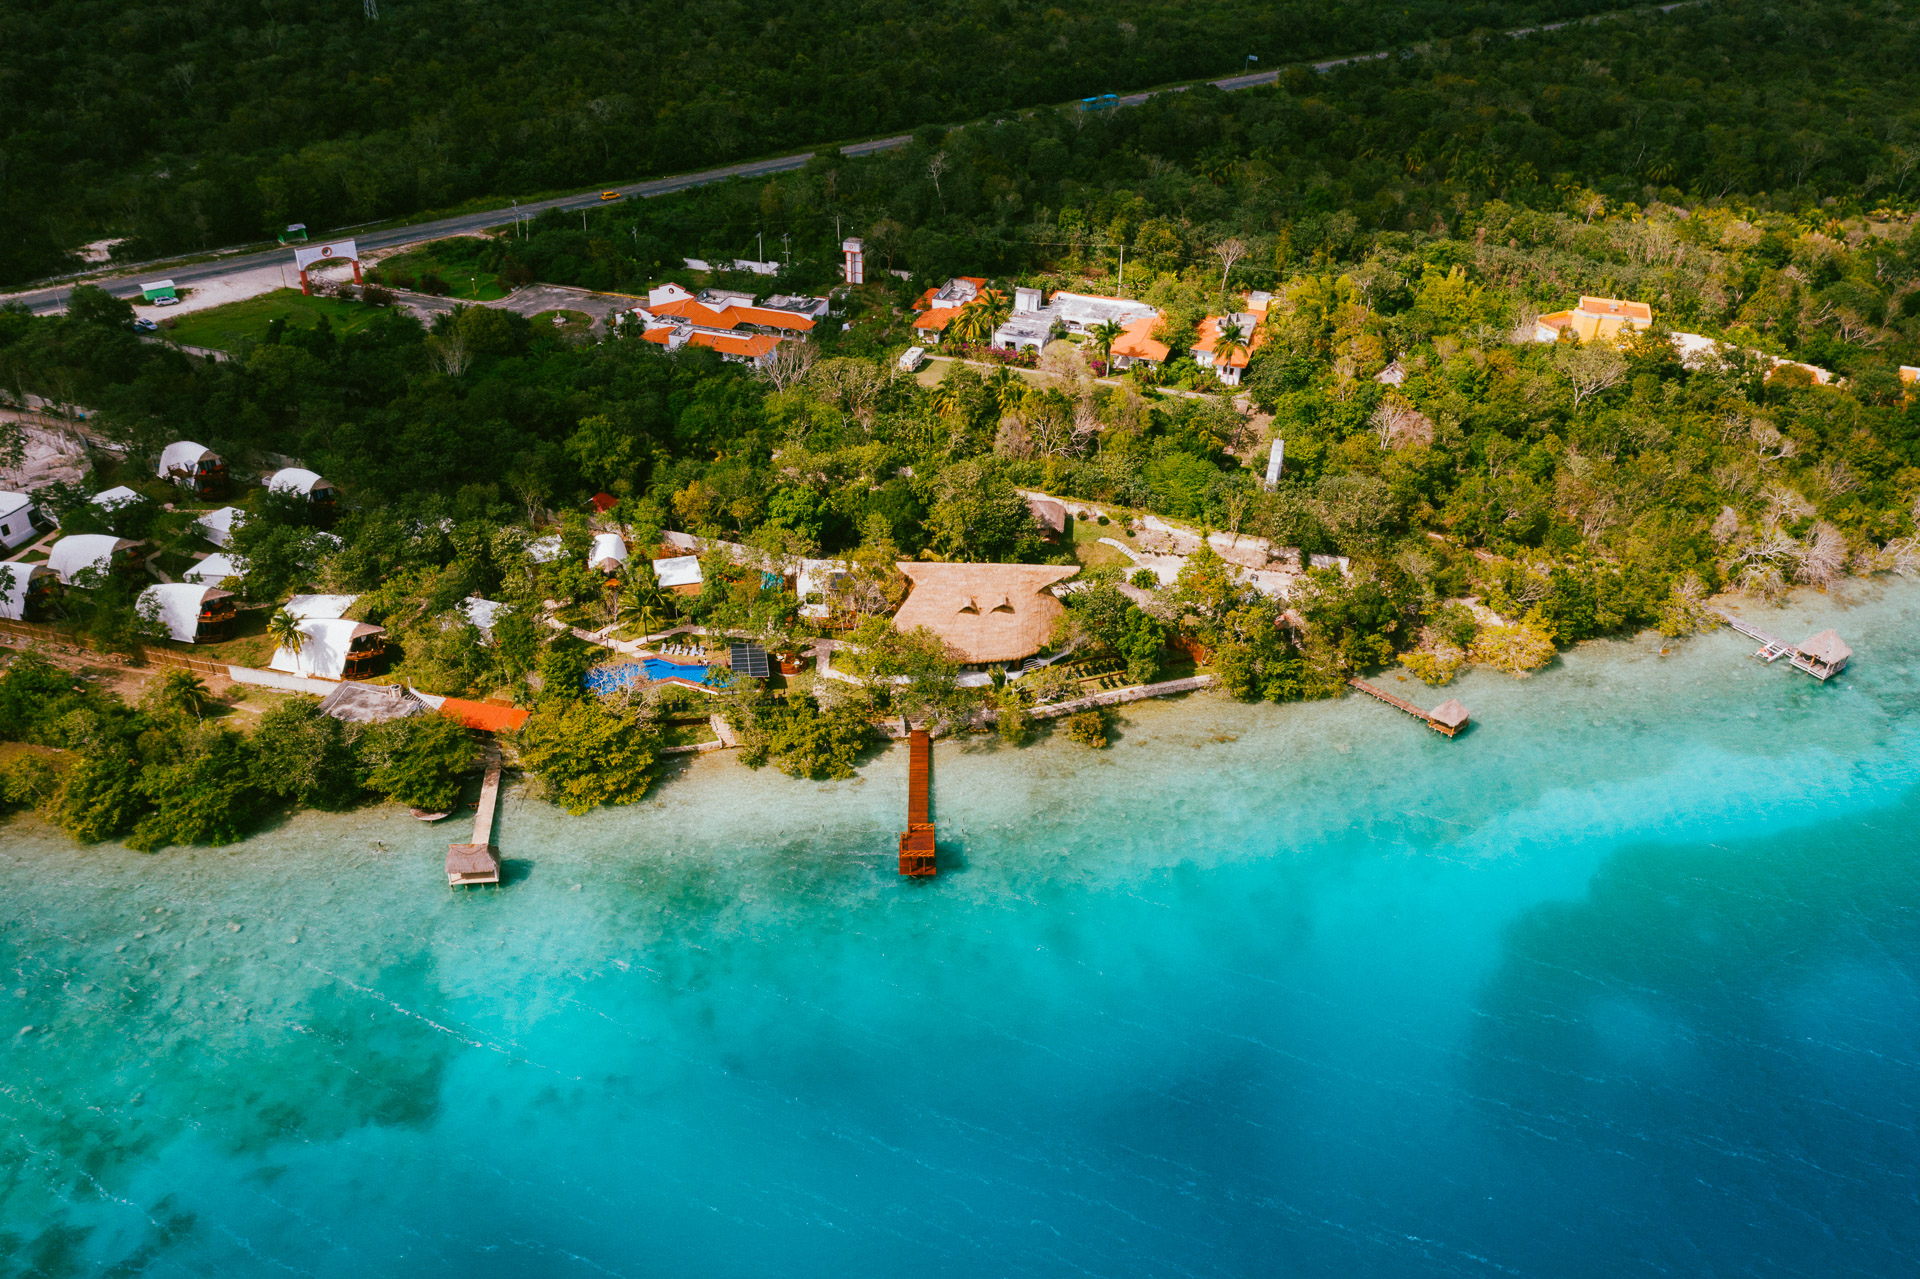 mexico-luxury-hotel-photographer-riviera-maya-mia-bacalar-18.jpg